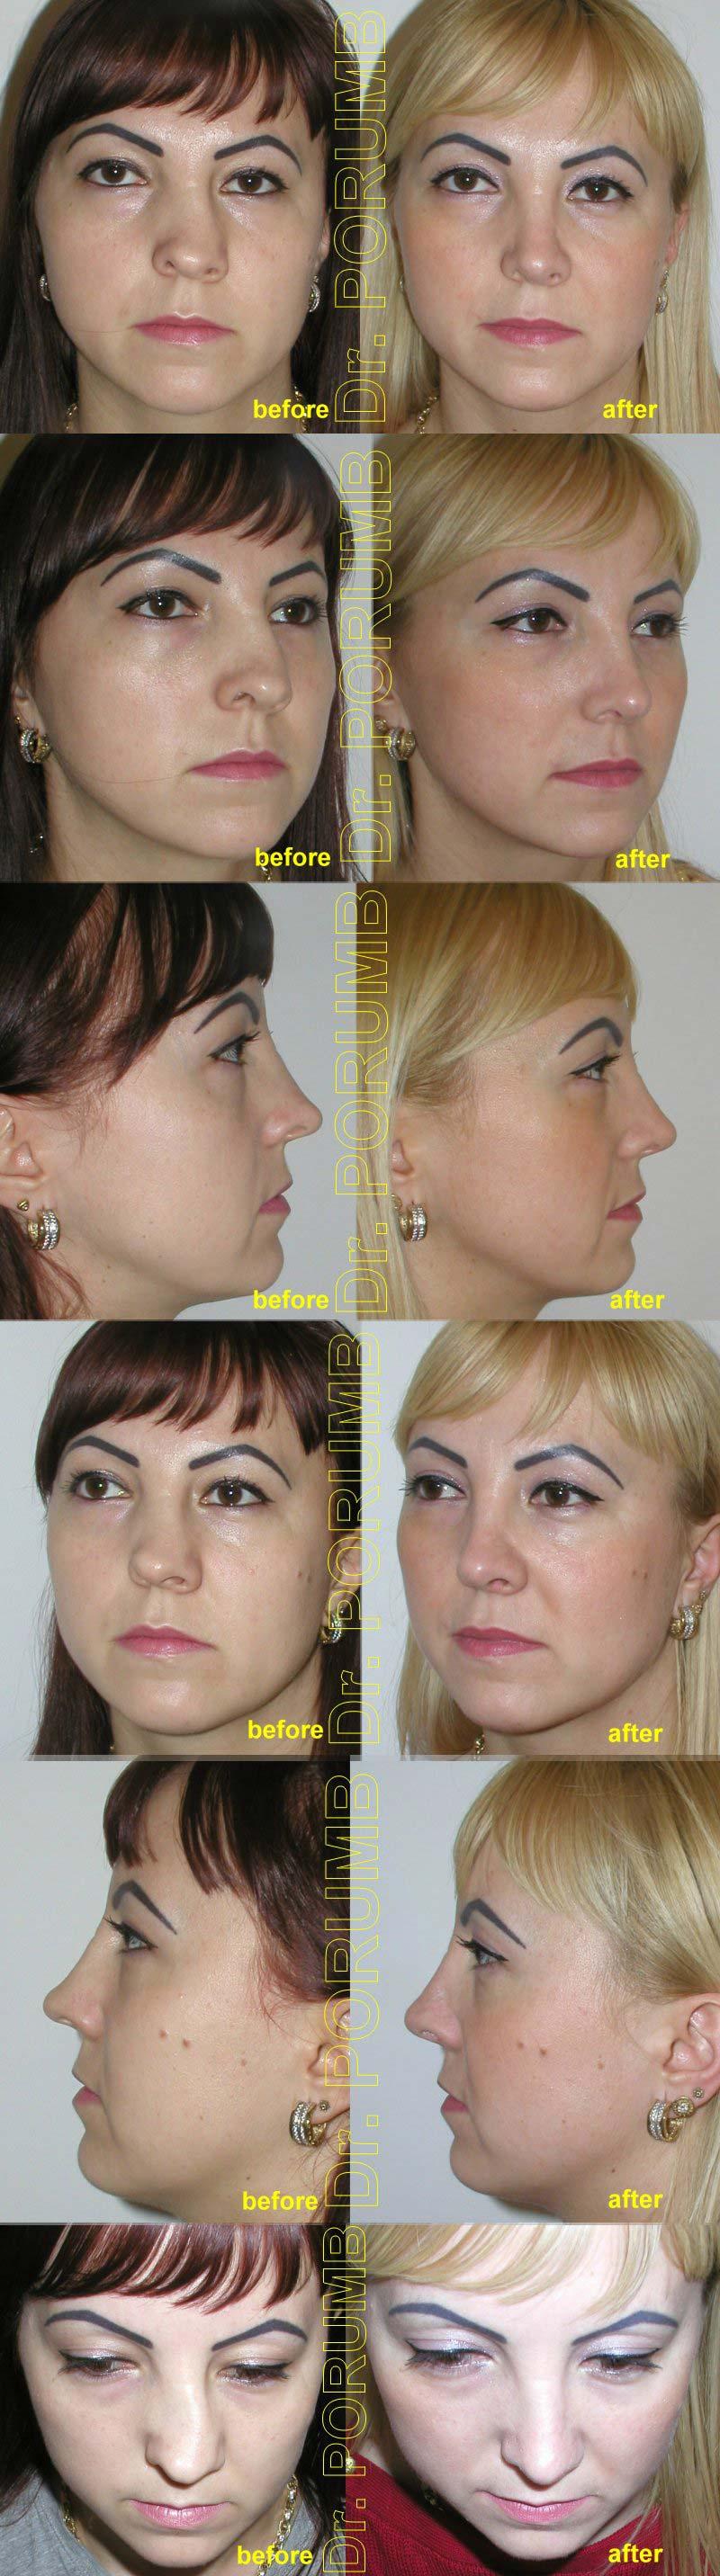 Pacienta de 29 ani, nemultumita de deviatia majora a nasului, de deviatia de sep